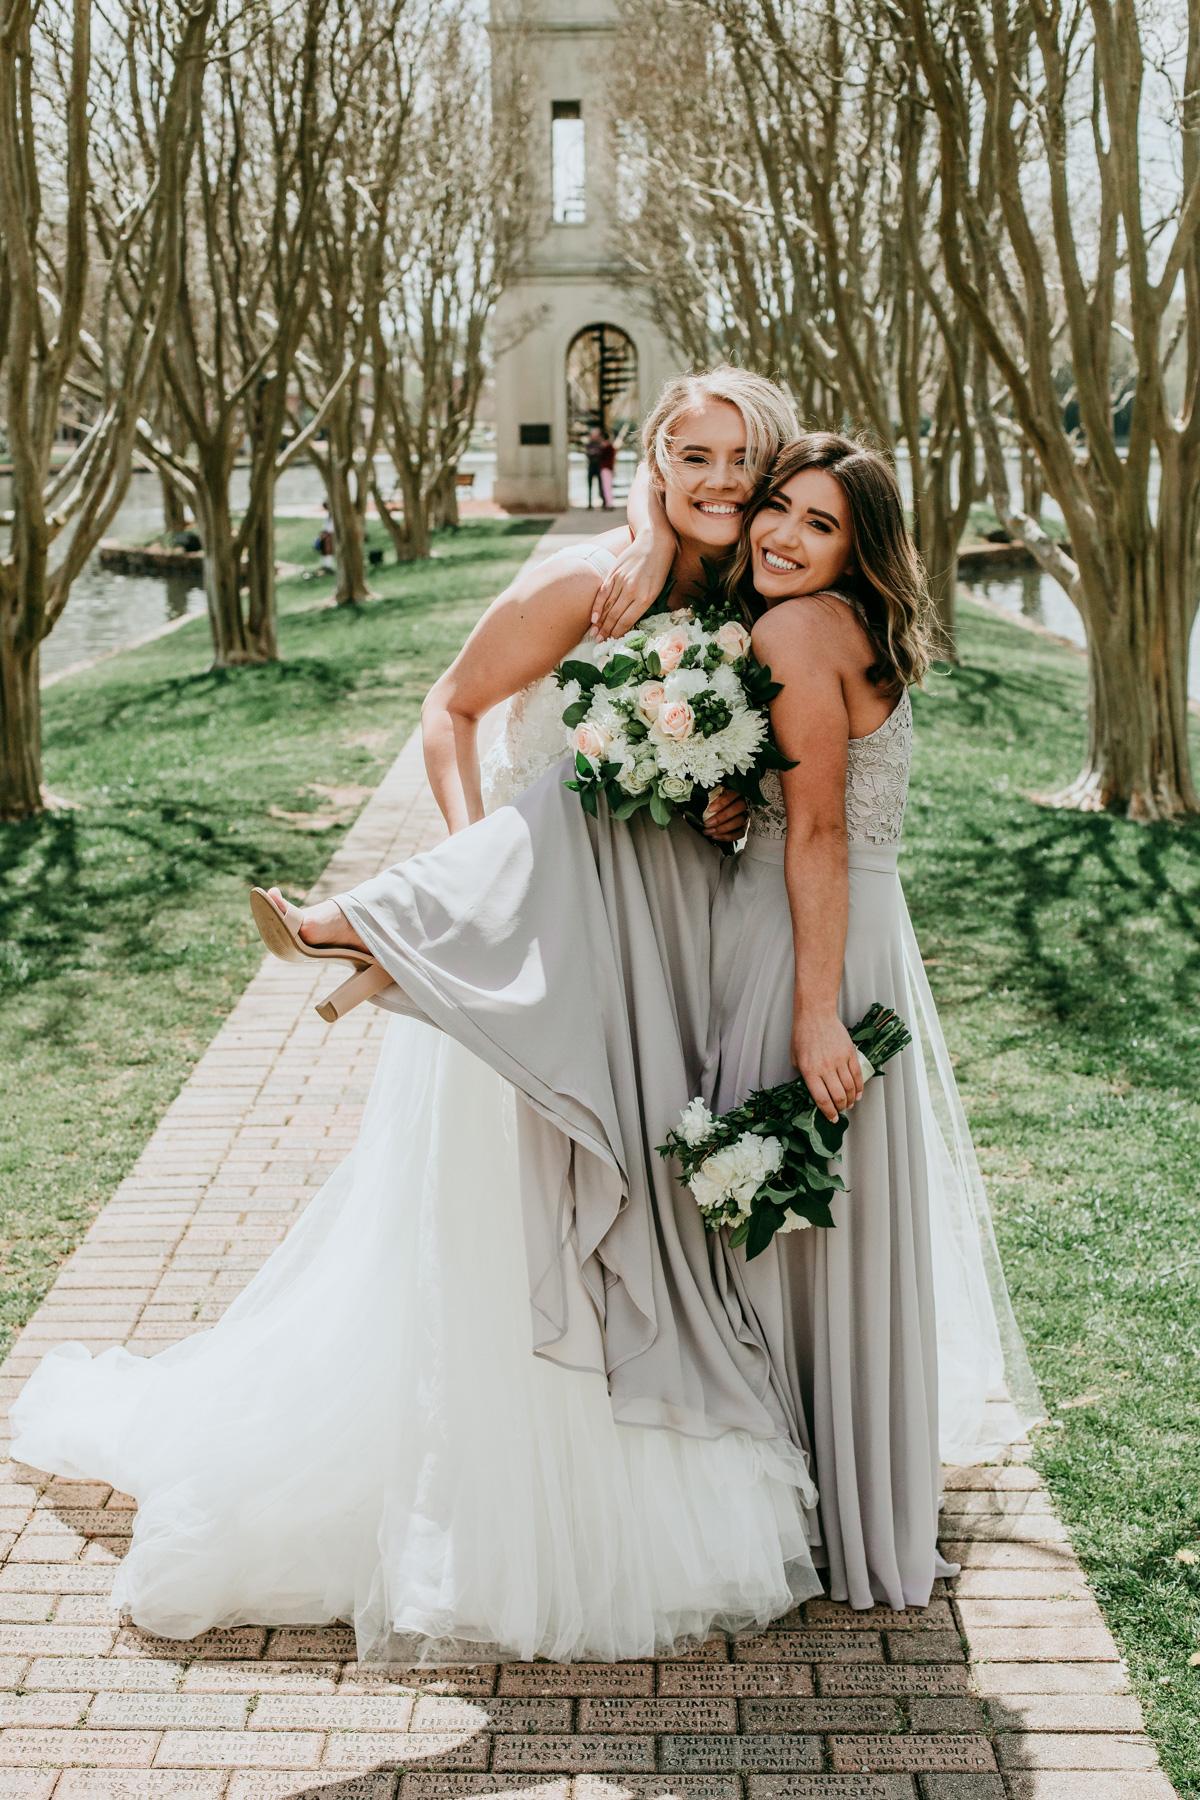 fun-bride-and-bridesmaid-photo-session.jpg